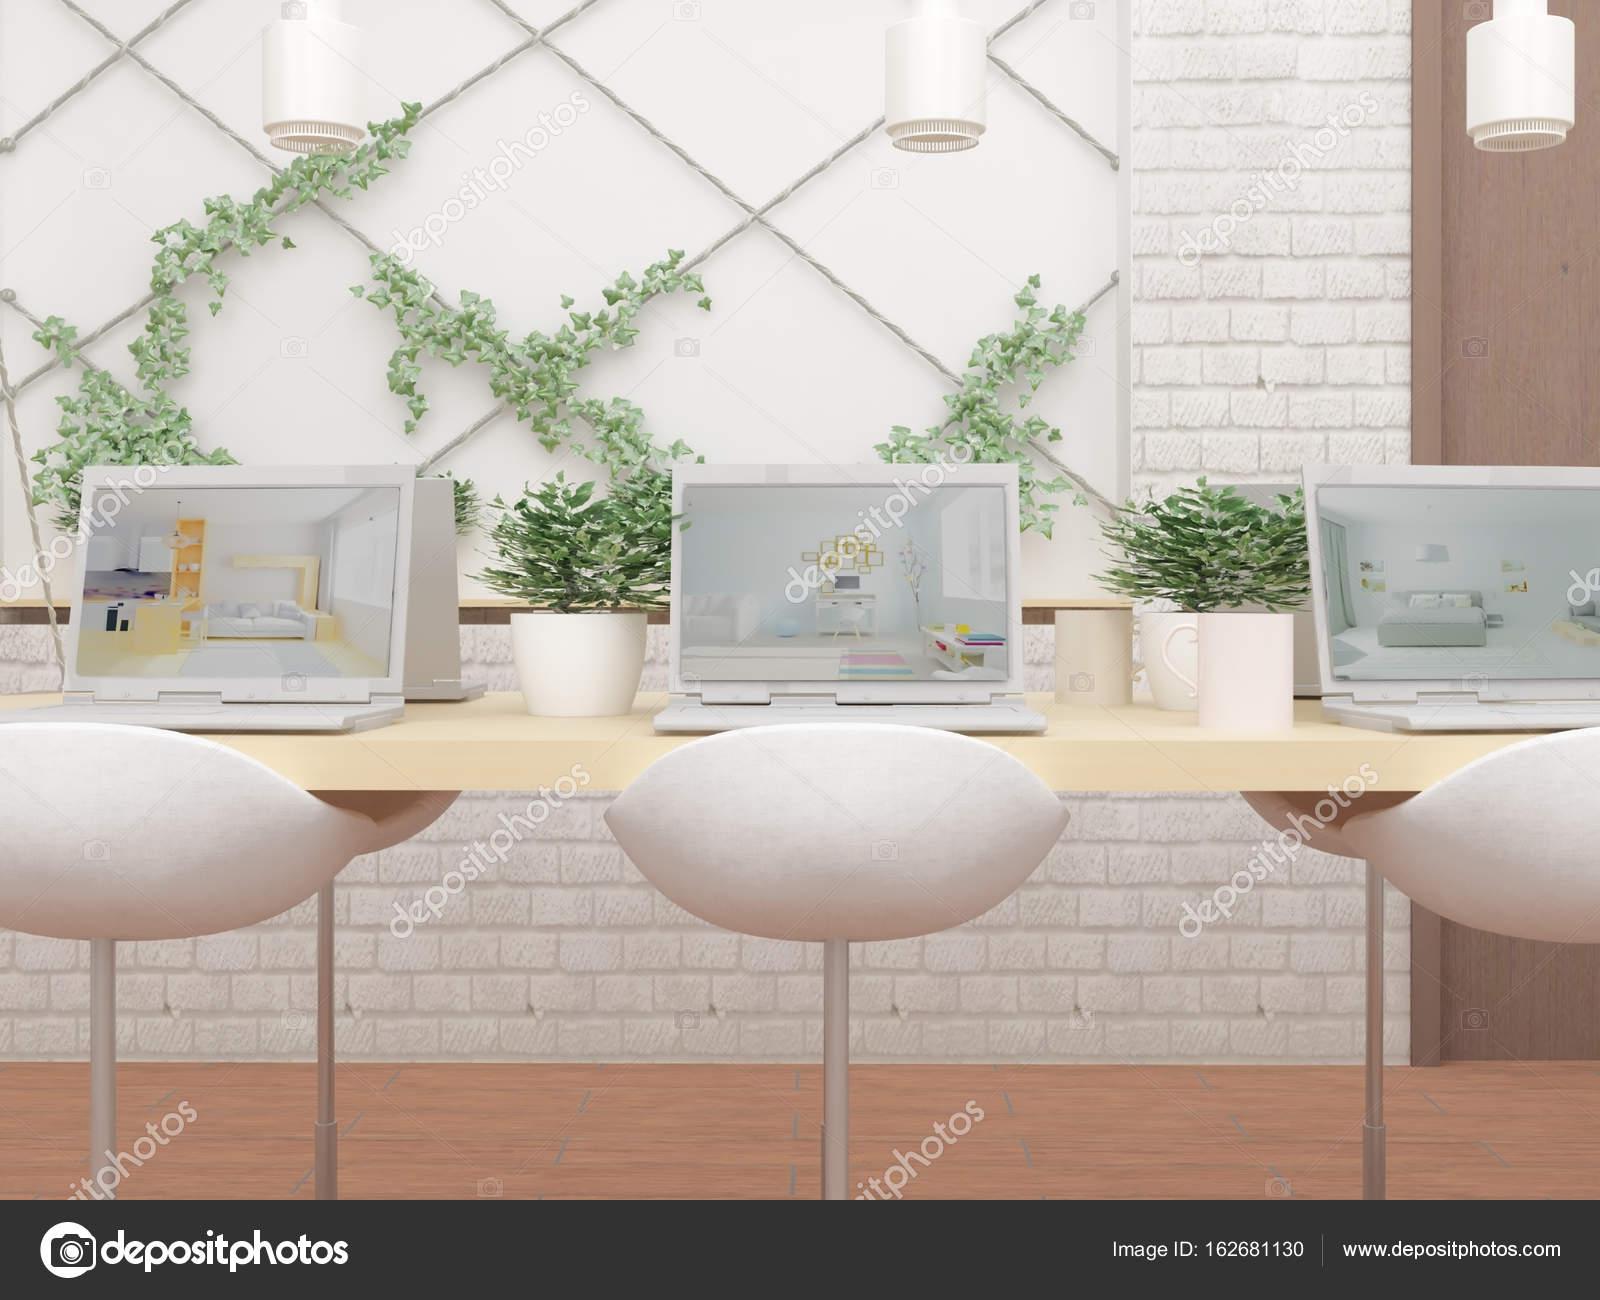 Computers op de tuinset groene planten u2014 stockfoto © lisunova